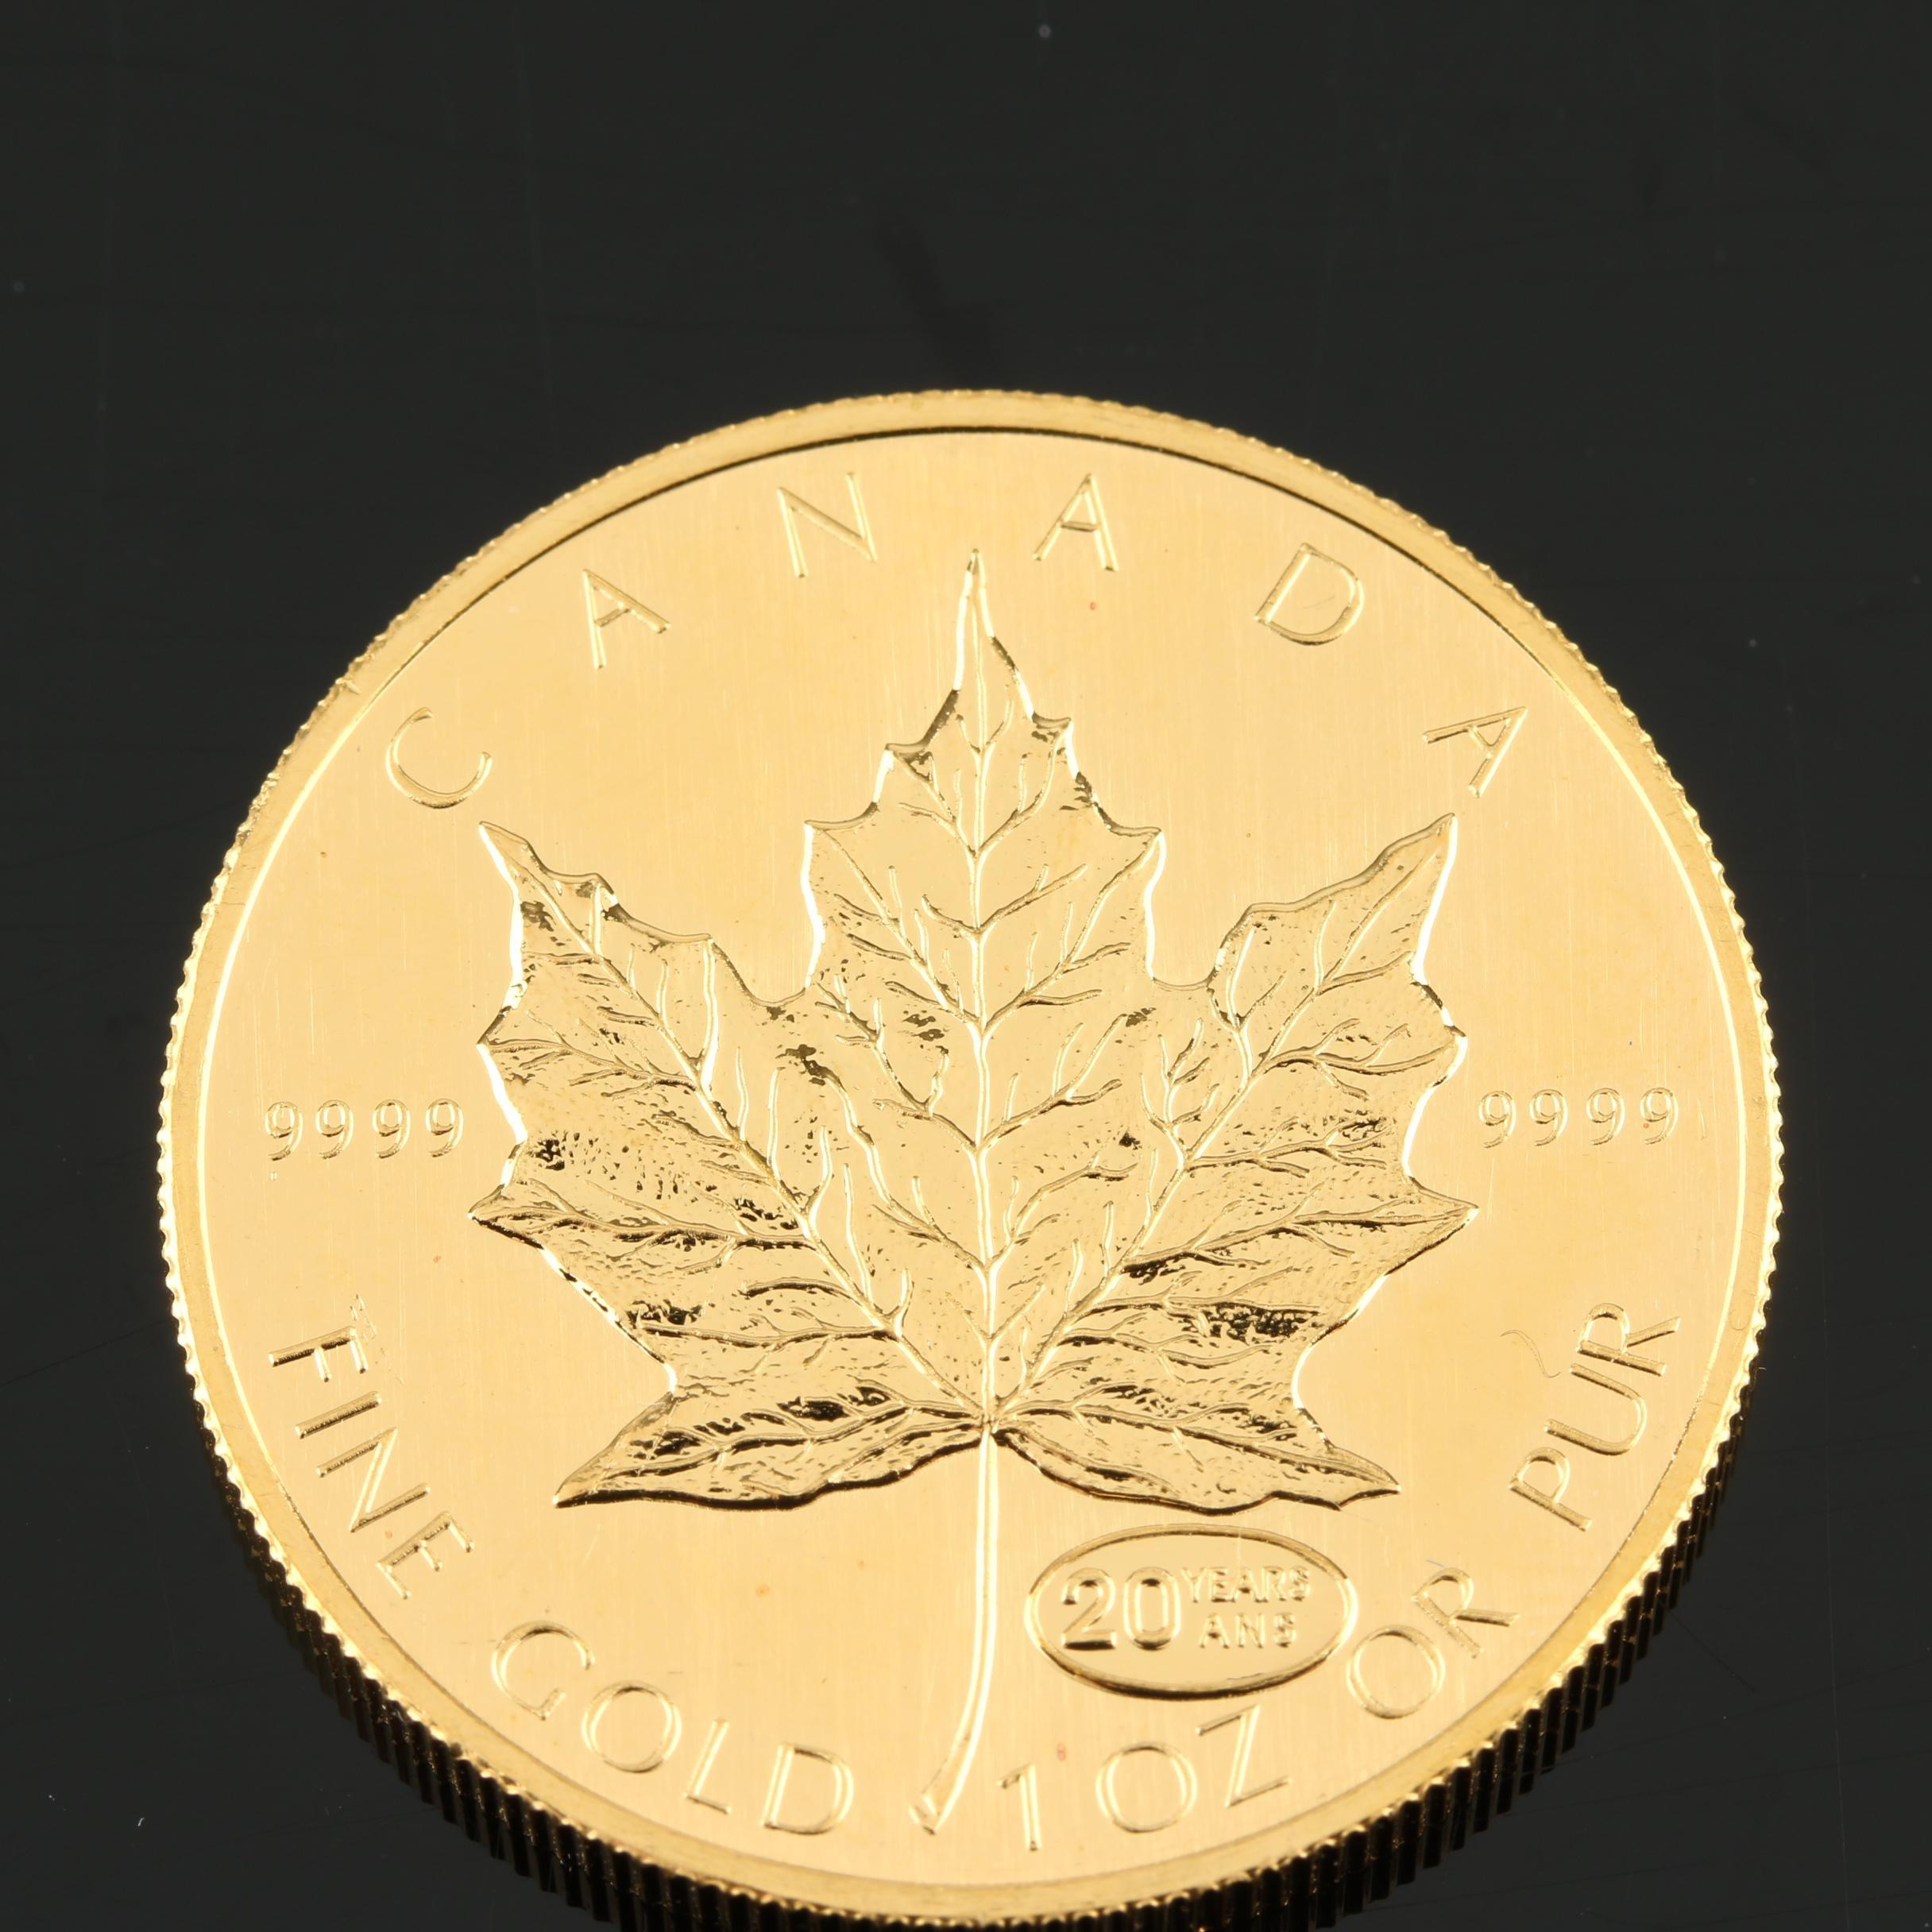 1999 Canadian 20th Anniversary $50 Gold Maple Leaf Bullion Coin